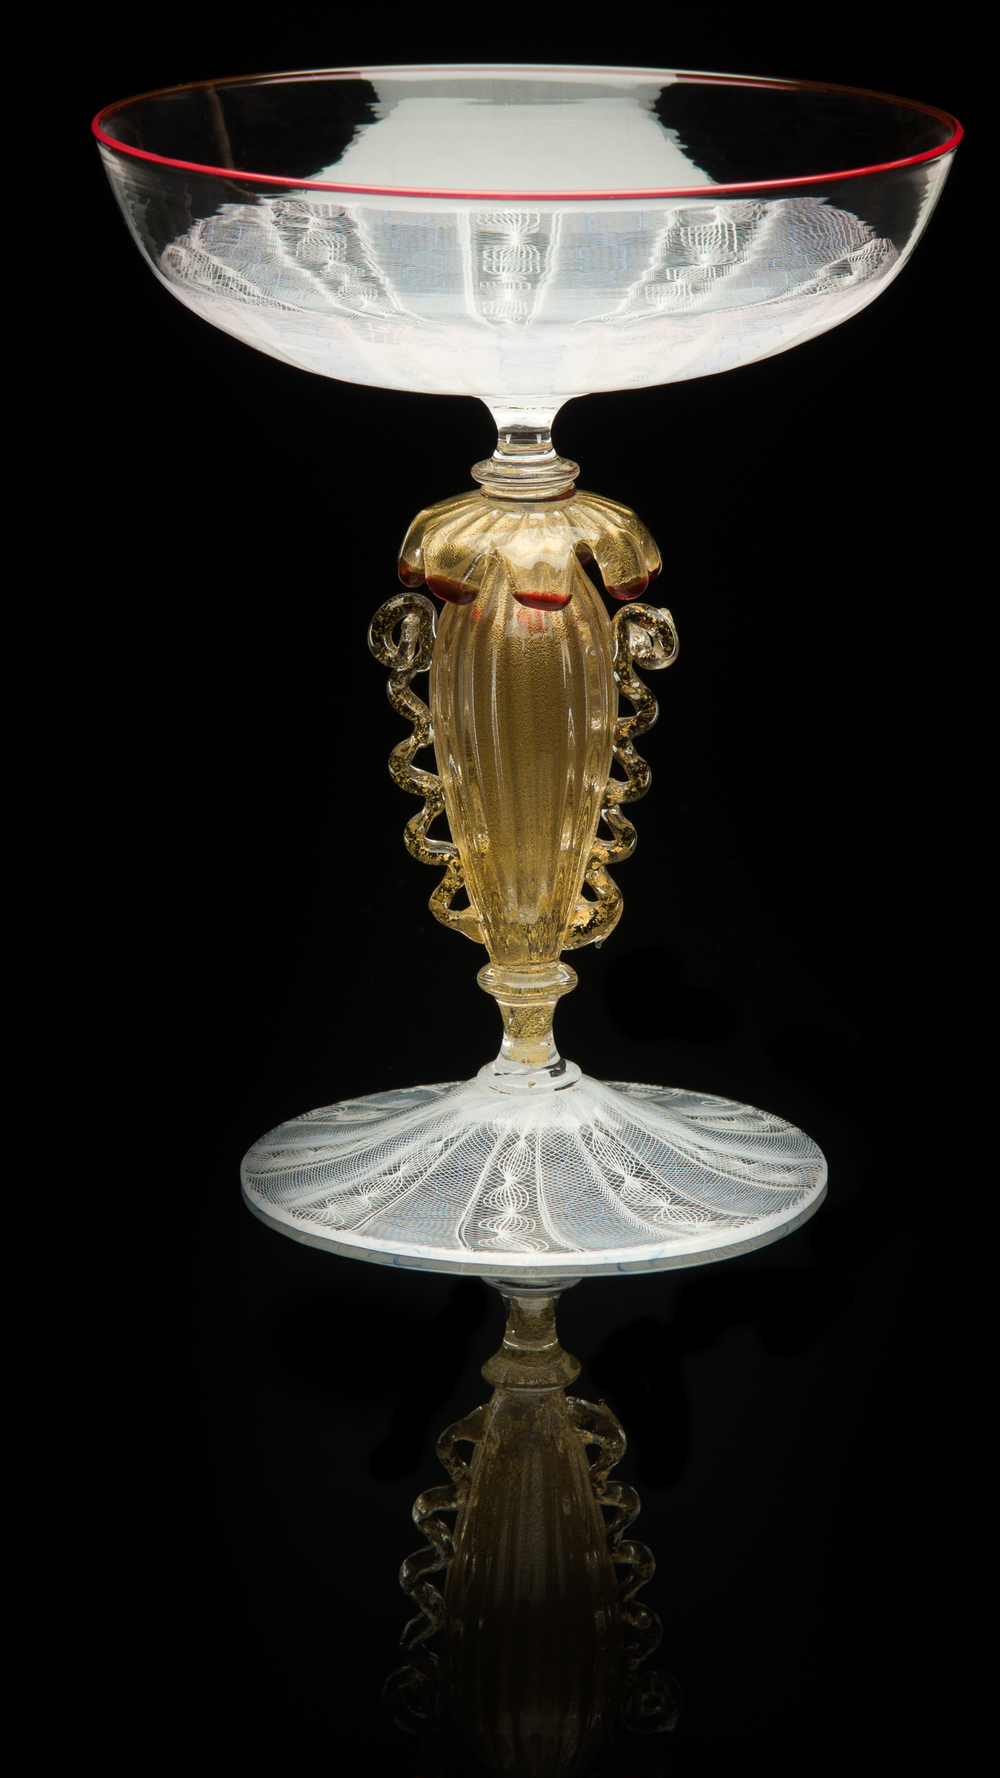 Lino Tagliapietra, Goblet (1991-1994, glass, 6 1/4 x 5 1/16 x 5 1/16 inches), LT.15